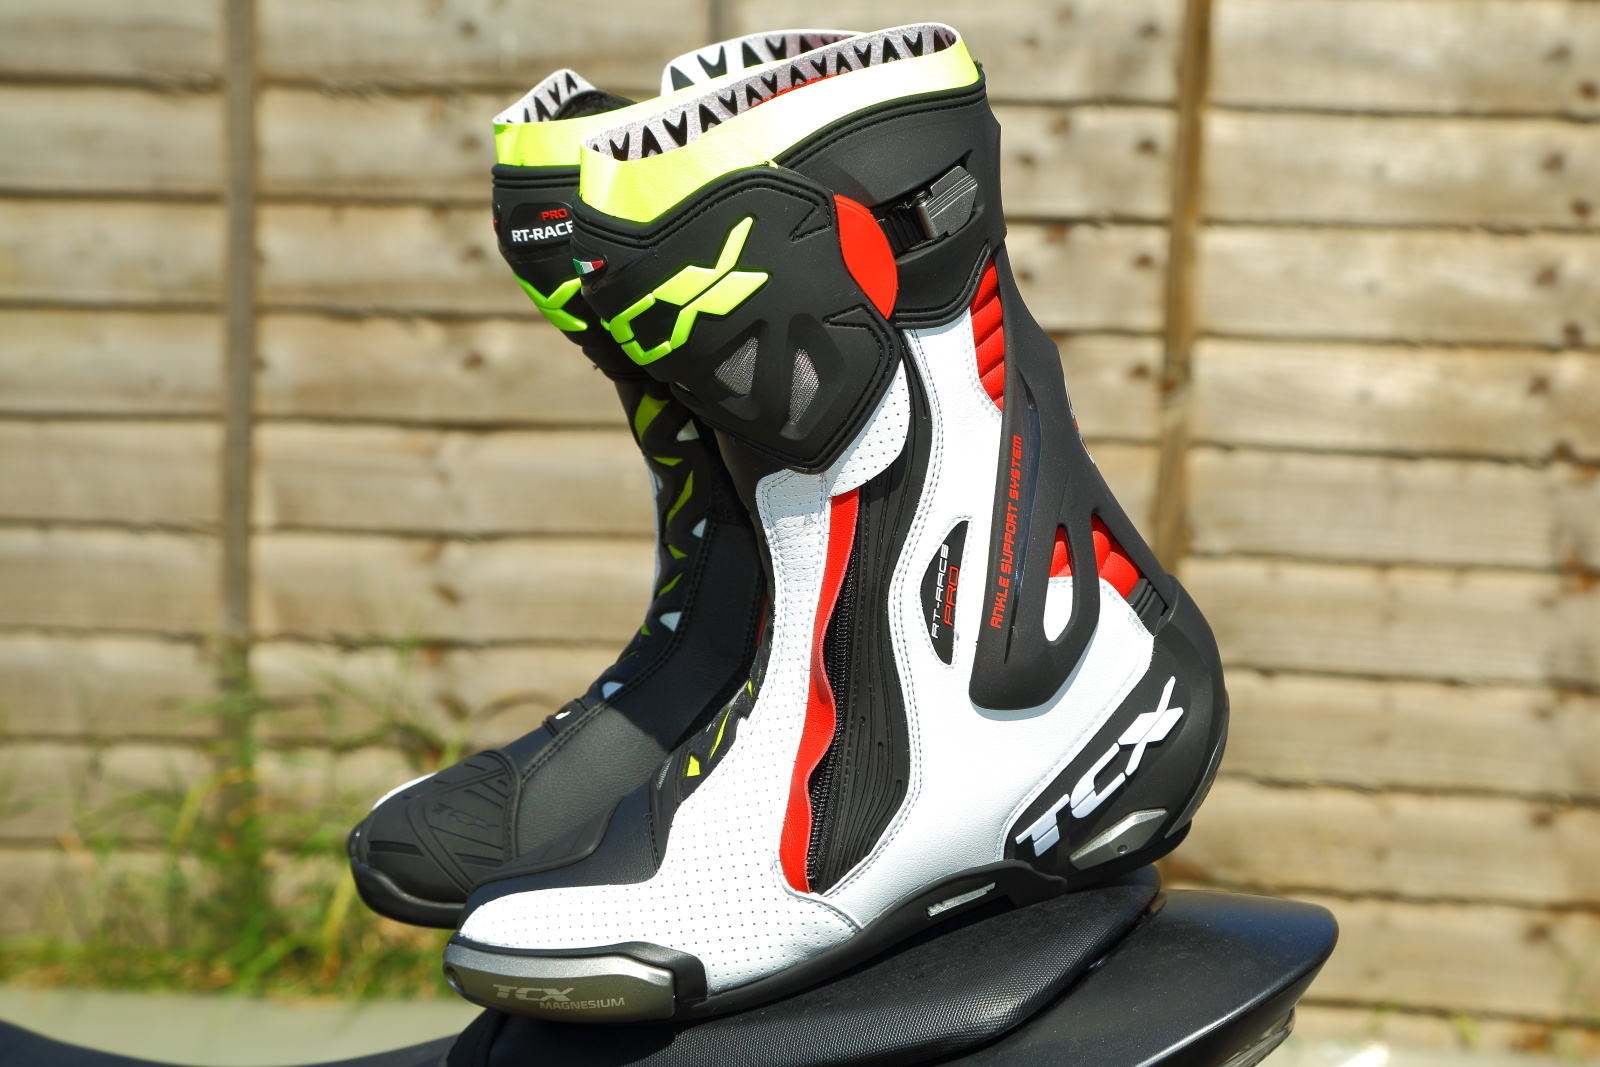 TCX RT-Race Pro boots